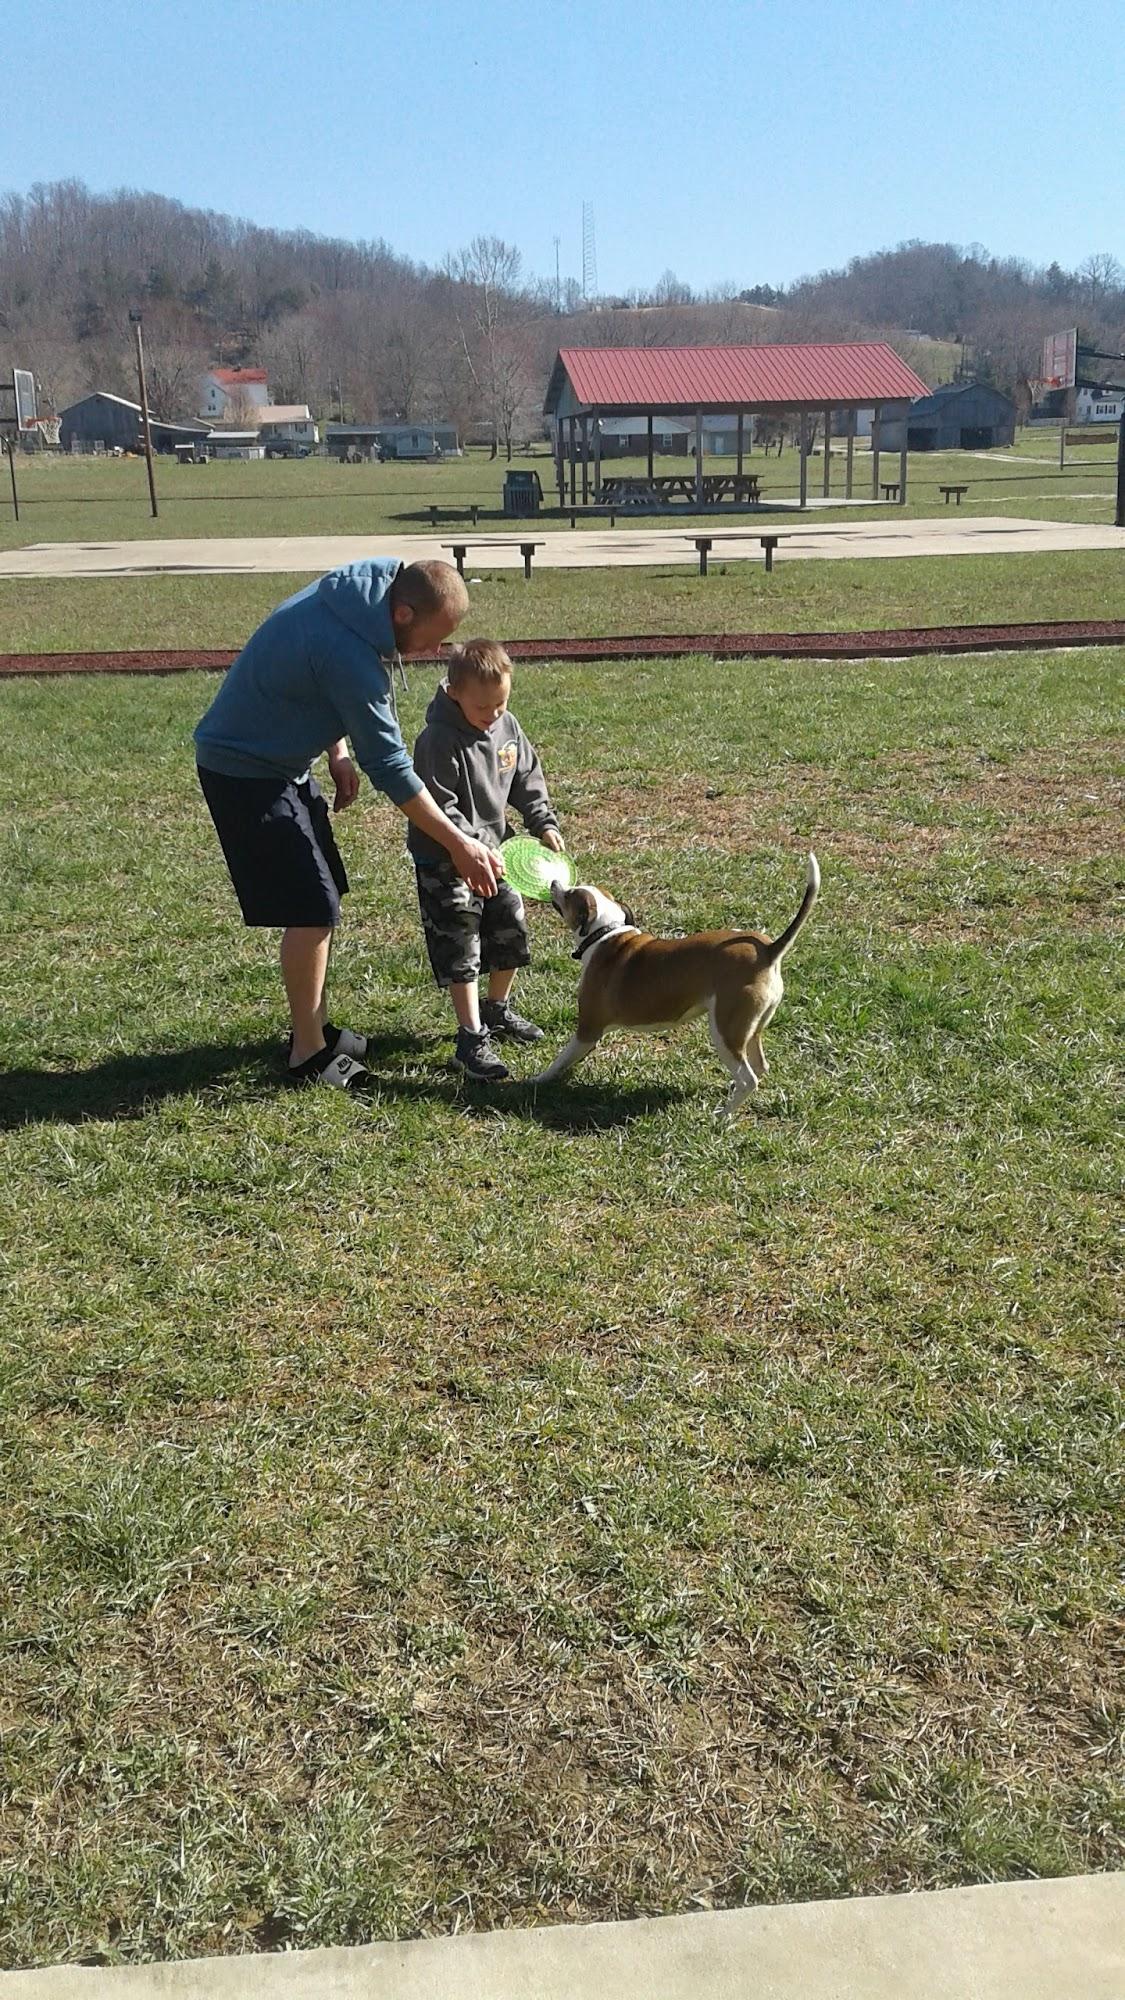 Wolfe county Animal Shelter 202 Pet Lane, Hazel Green